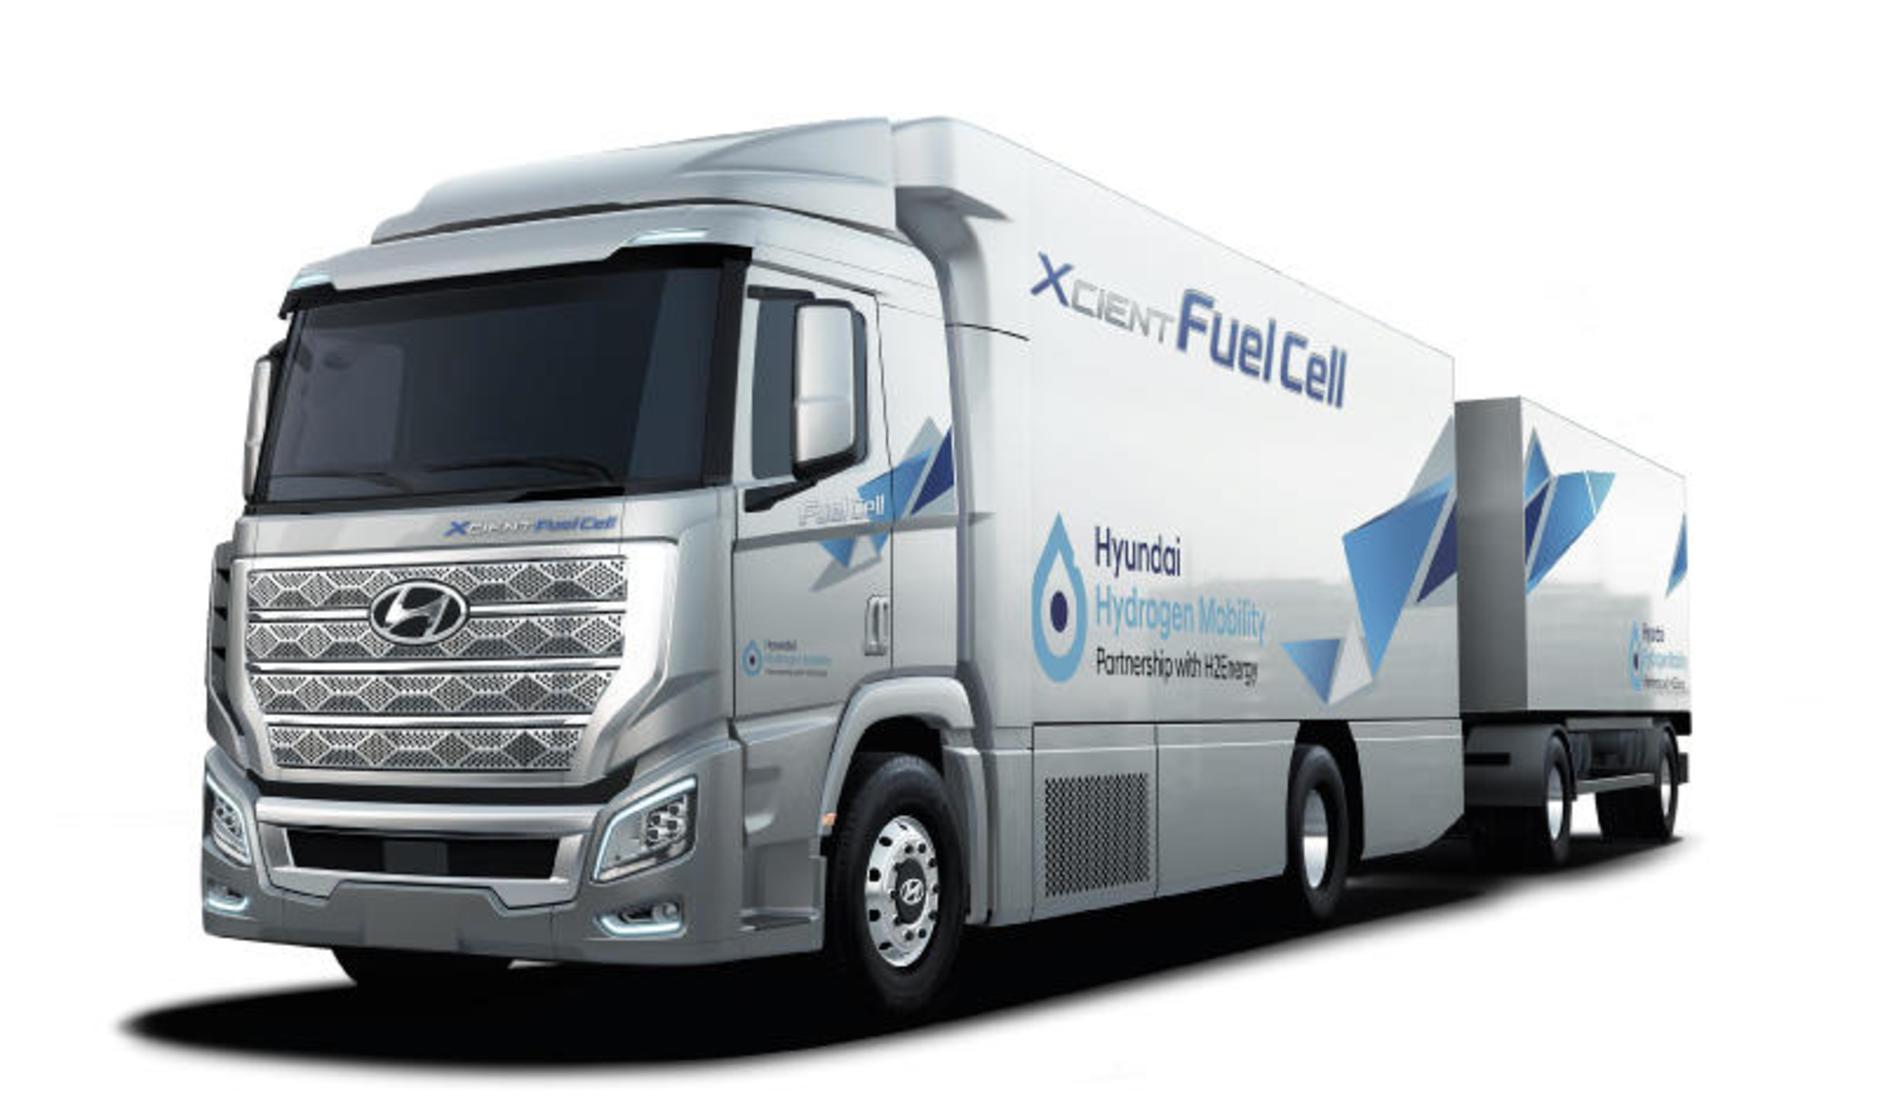 Camion Hyundai a idrogeno